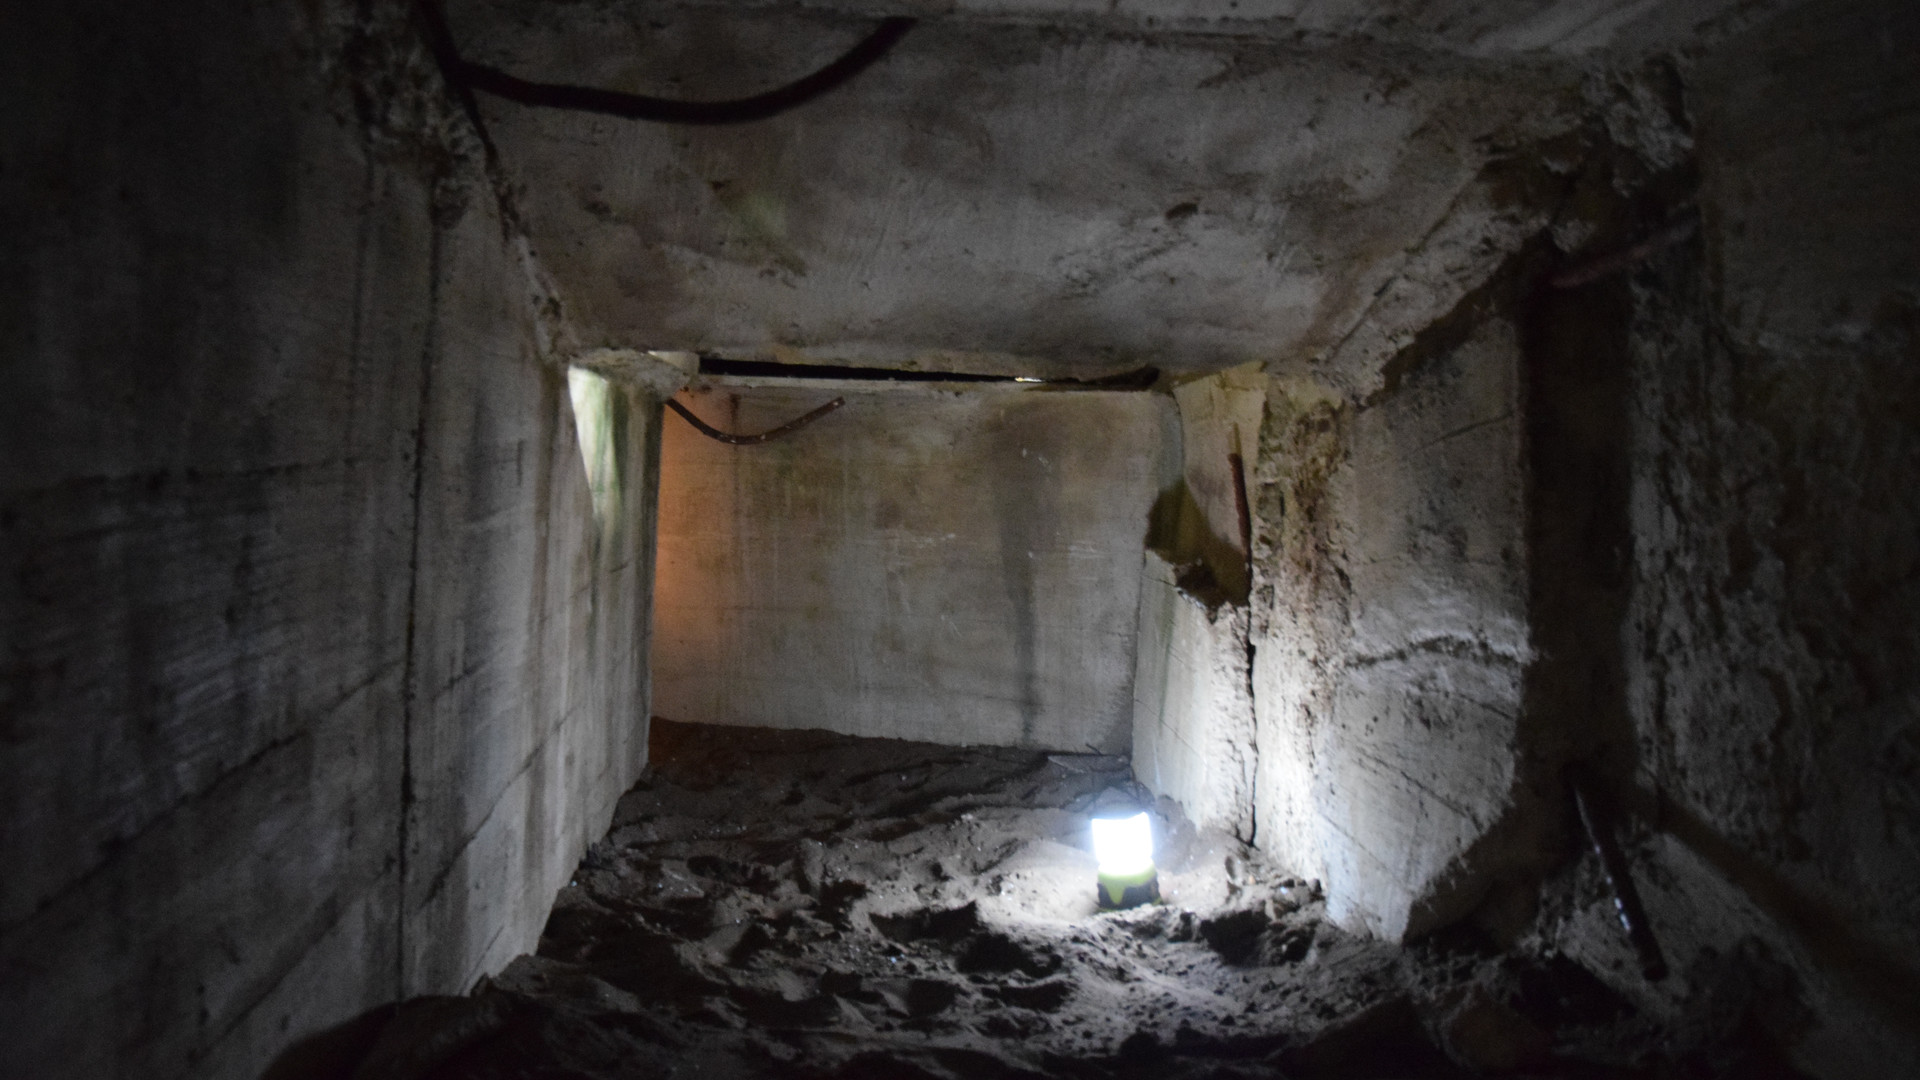 Tunnel fertig 3